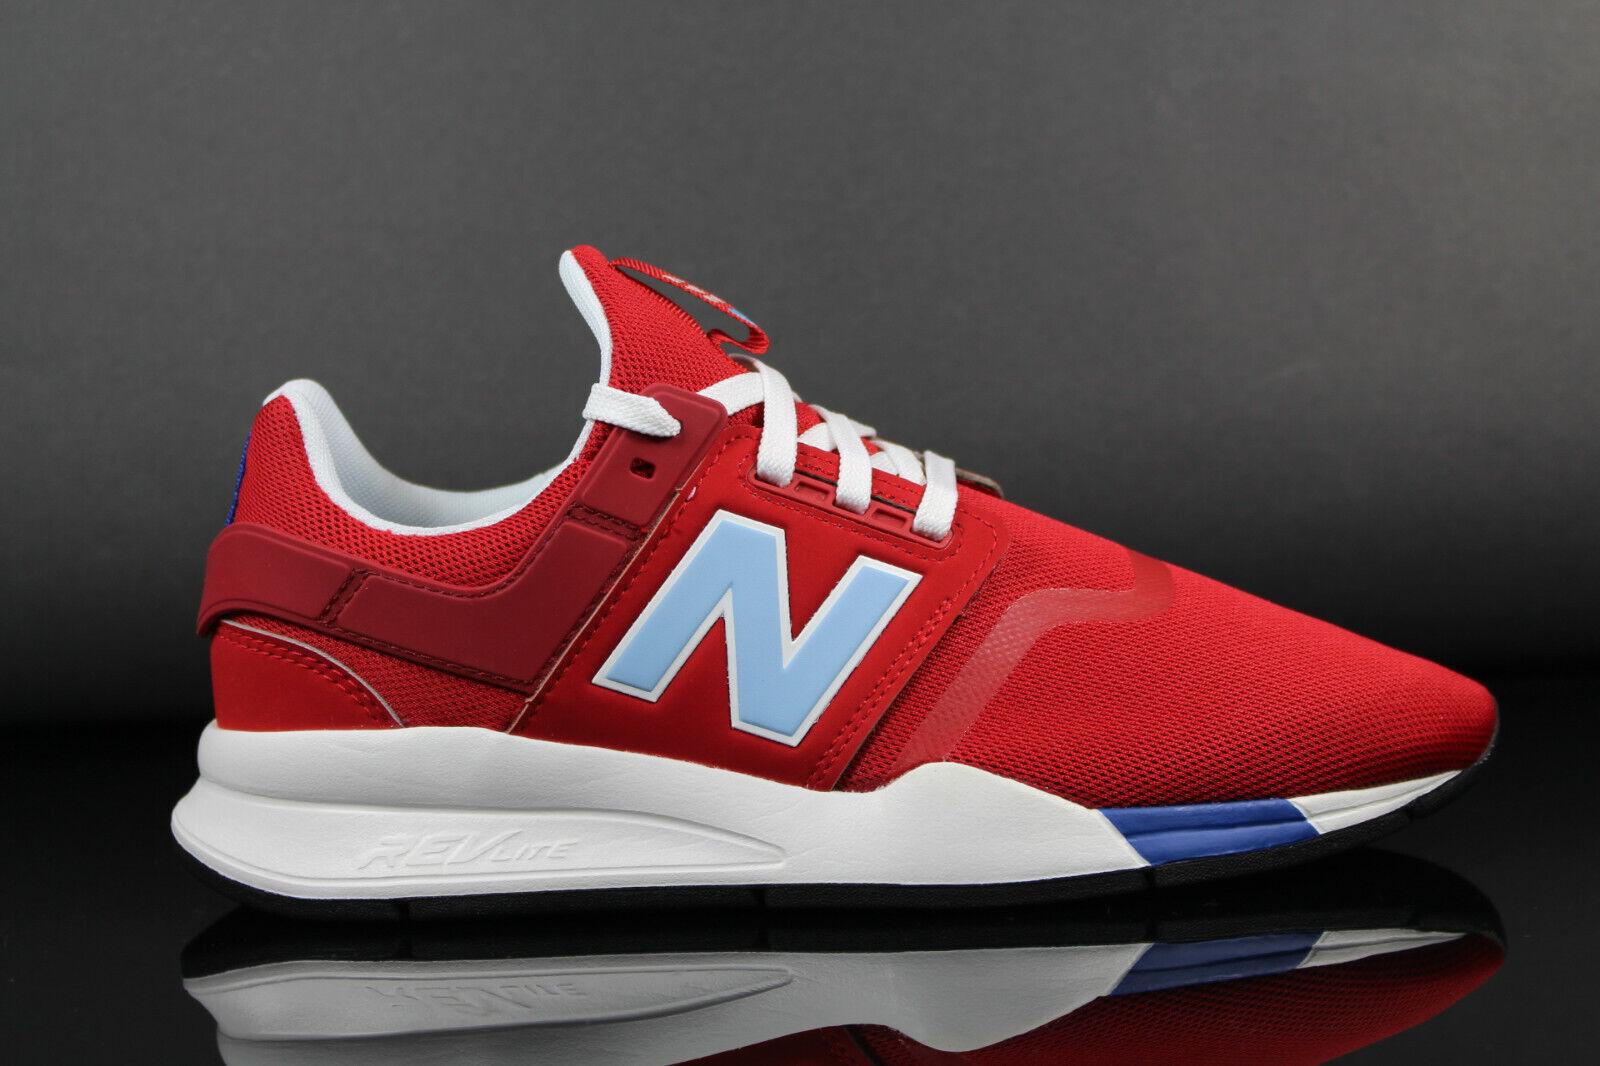 Neu New Balance MS247FP Herren Turnschuhe Sportschuhe Schuhe Turnschuhe Freizeit